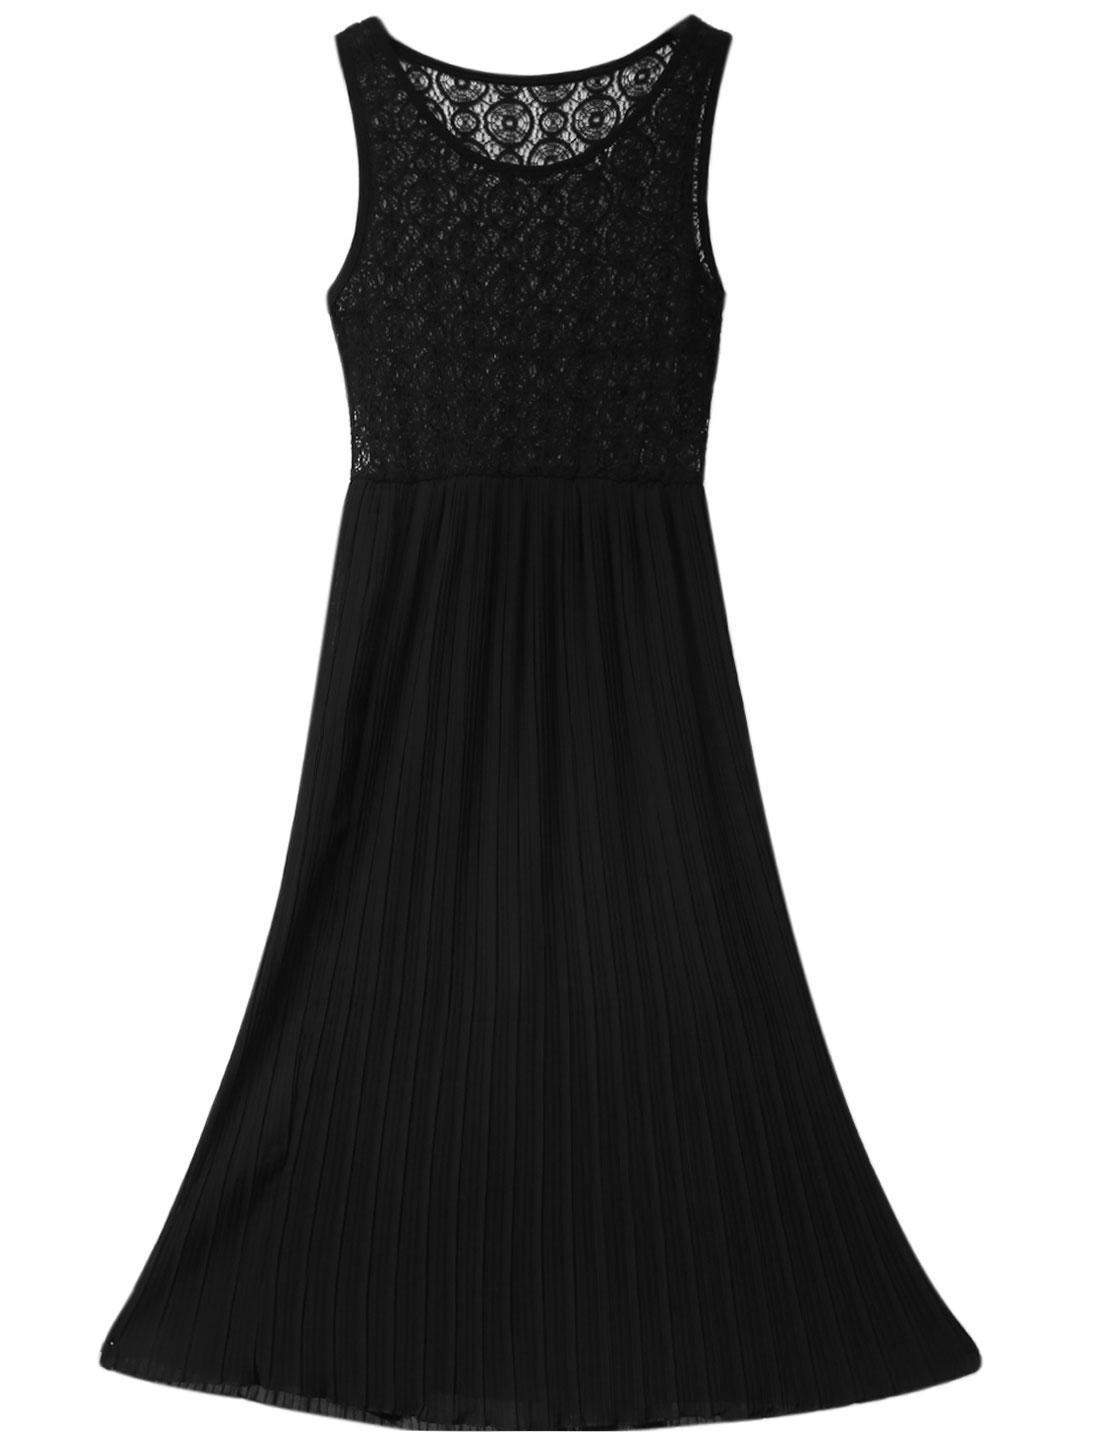 Lady Sleeveless Elastic Waist Lace Panel Pleated Dress Black XS